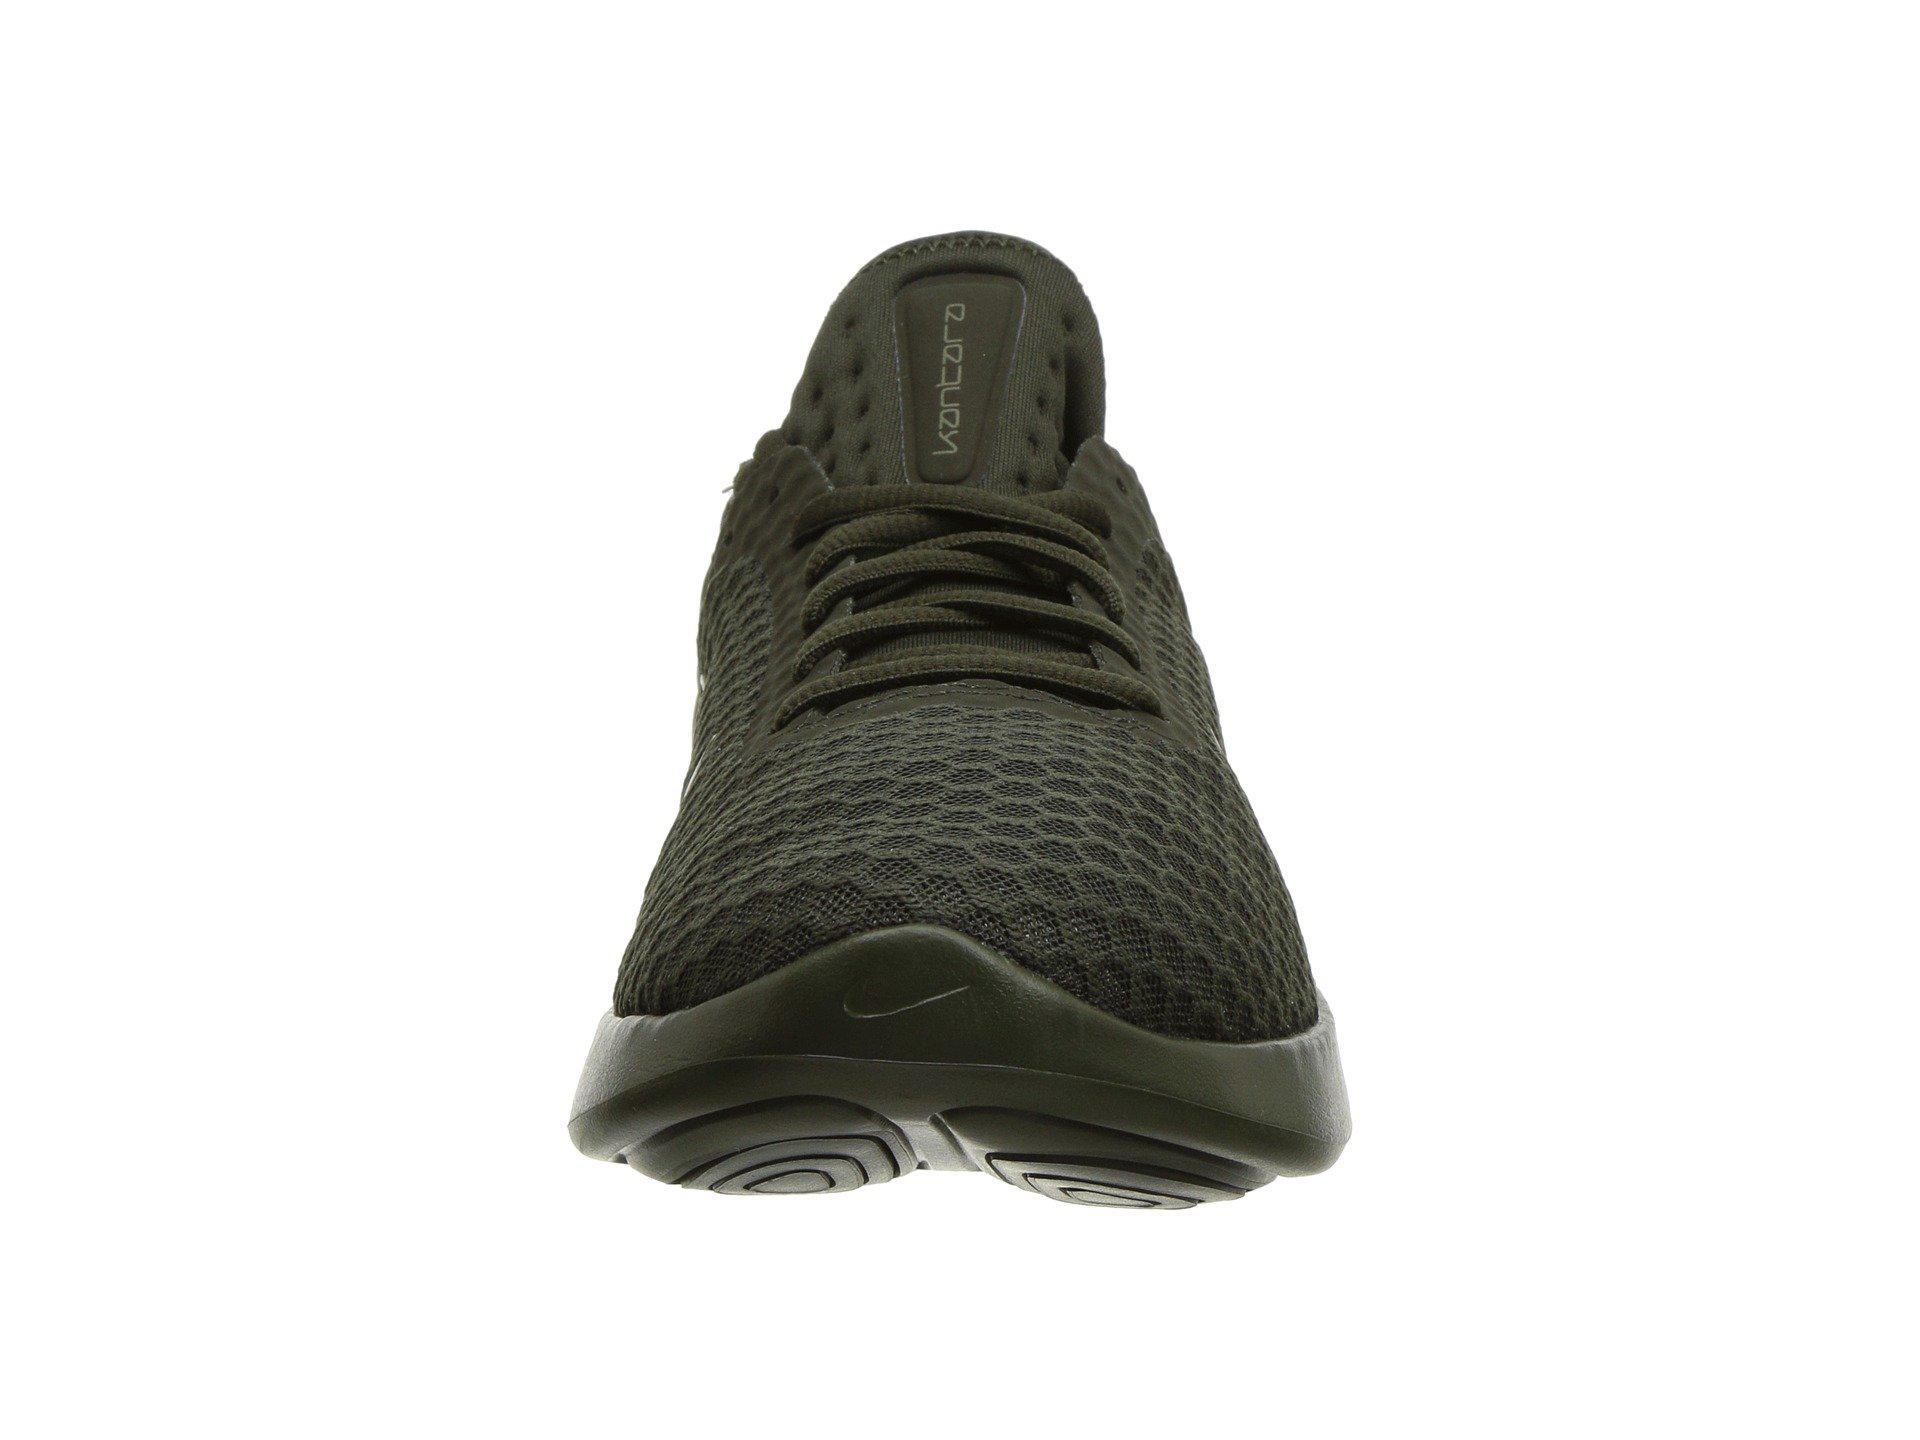 5a8a16a17 Nike Air Max Kantara (moon Particle/sepia Stone/vast Grey) Men's ...